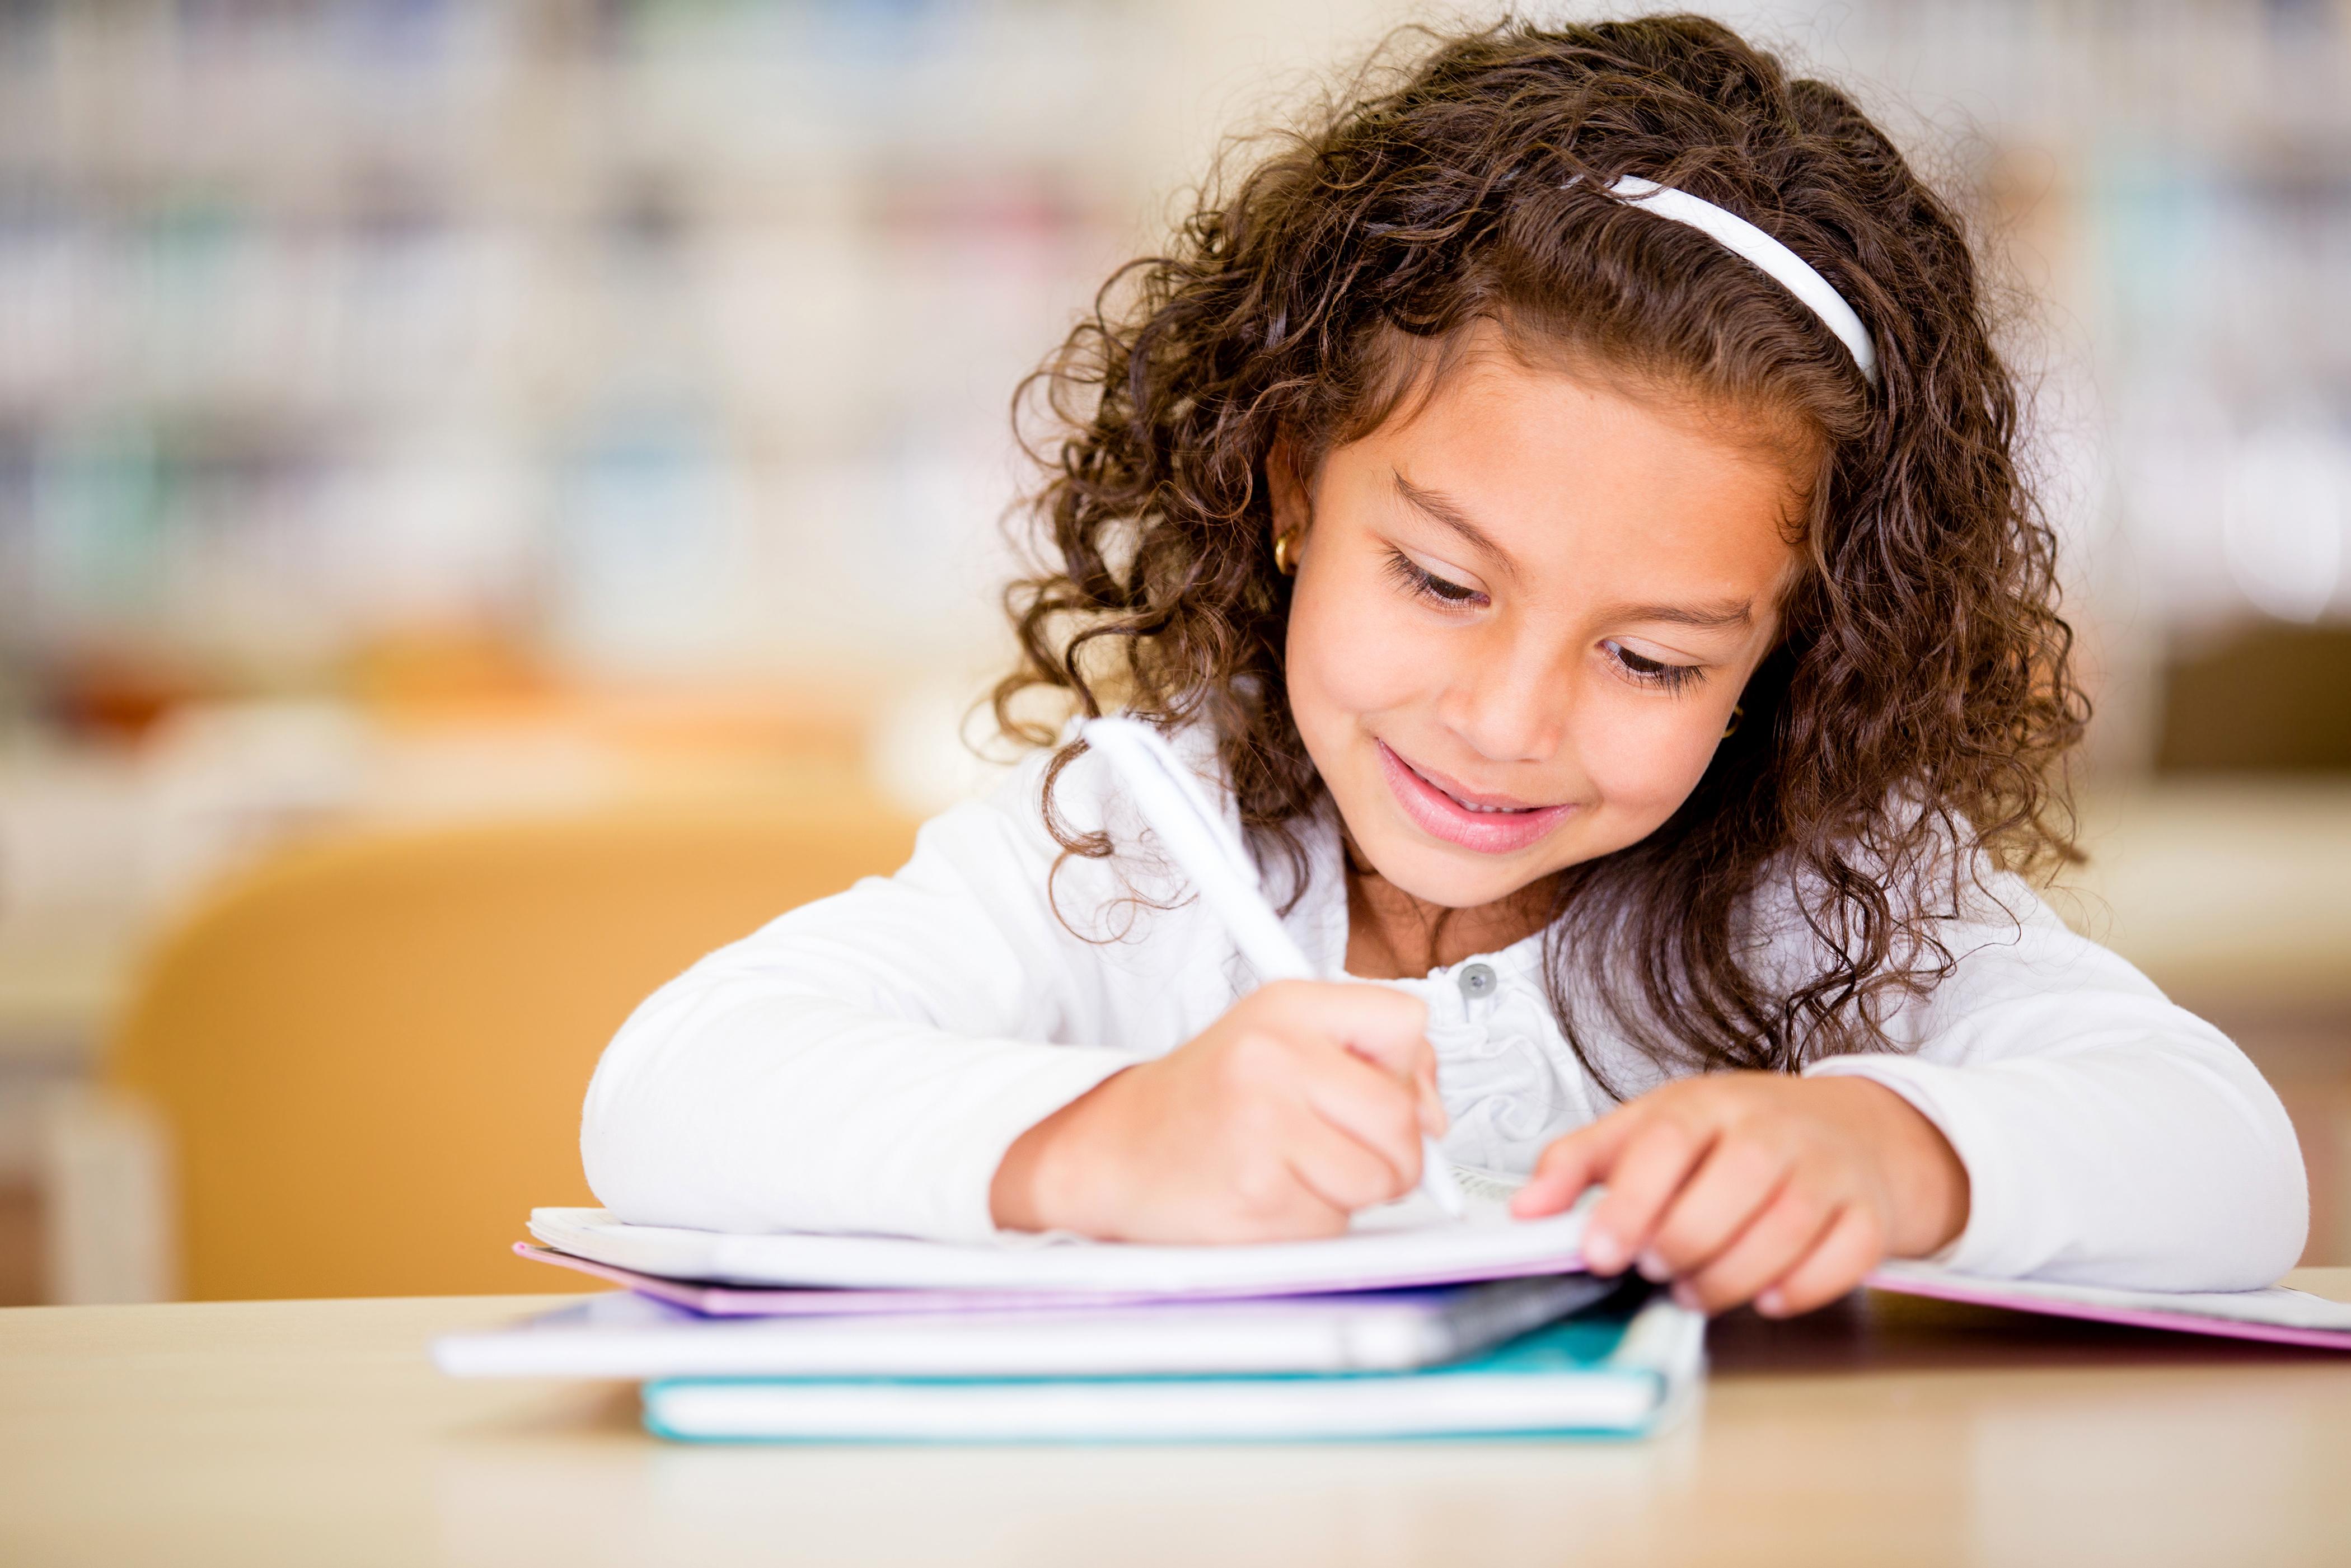 Neuropsychology of childhood. Center for Pediatric Neuropsychology